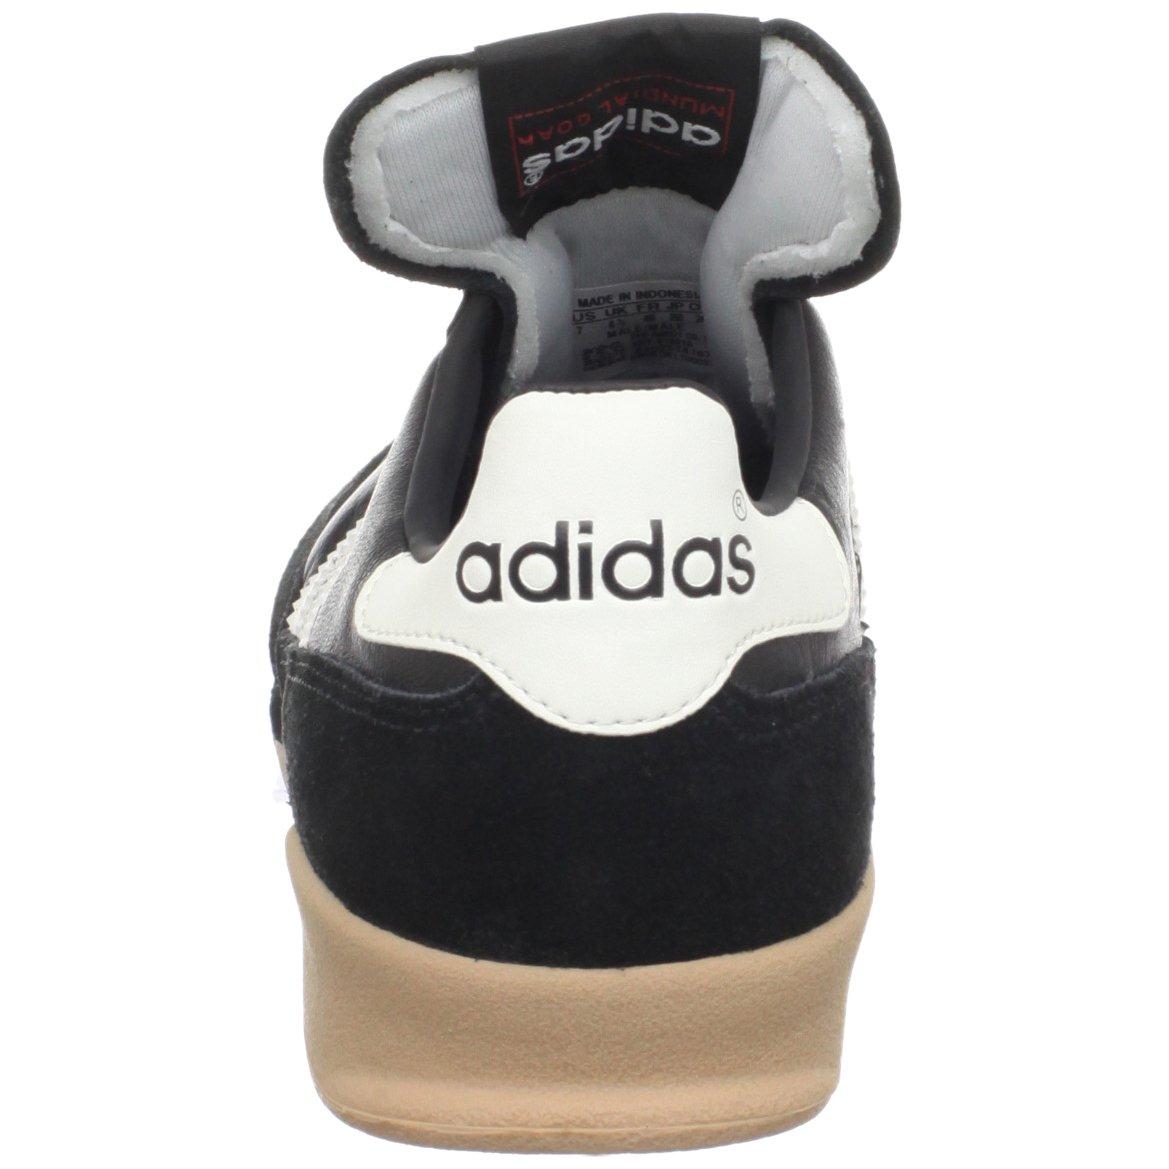 adidas Men's Mundial Goal Soccer Cleat, Black/White/White, 5 M US by adidas (Image #2)